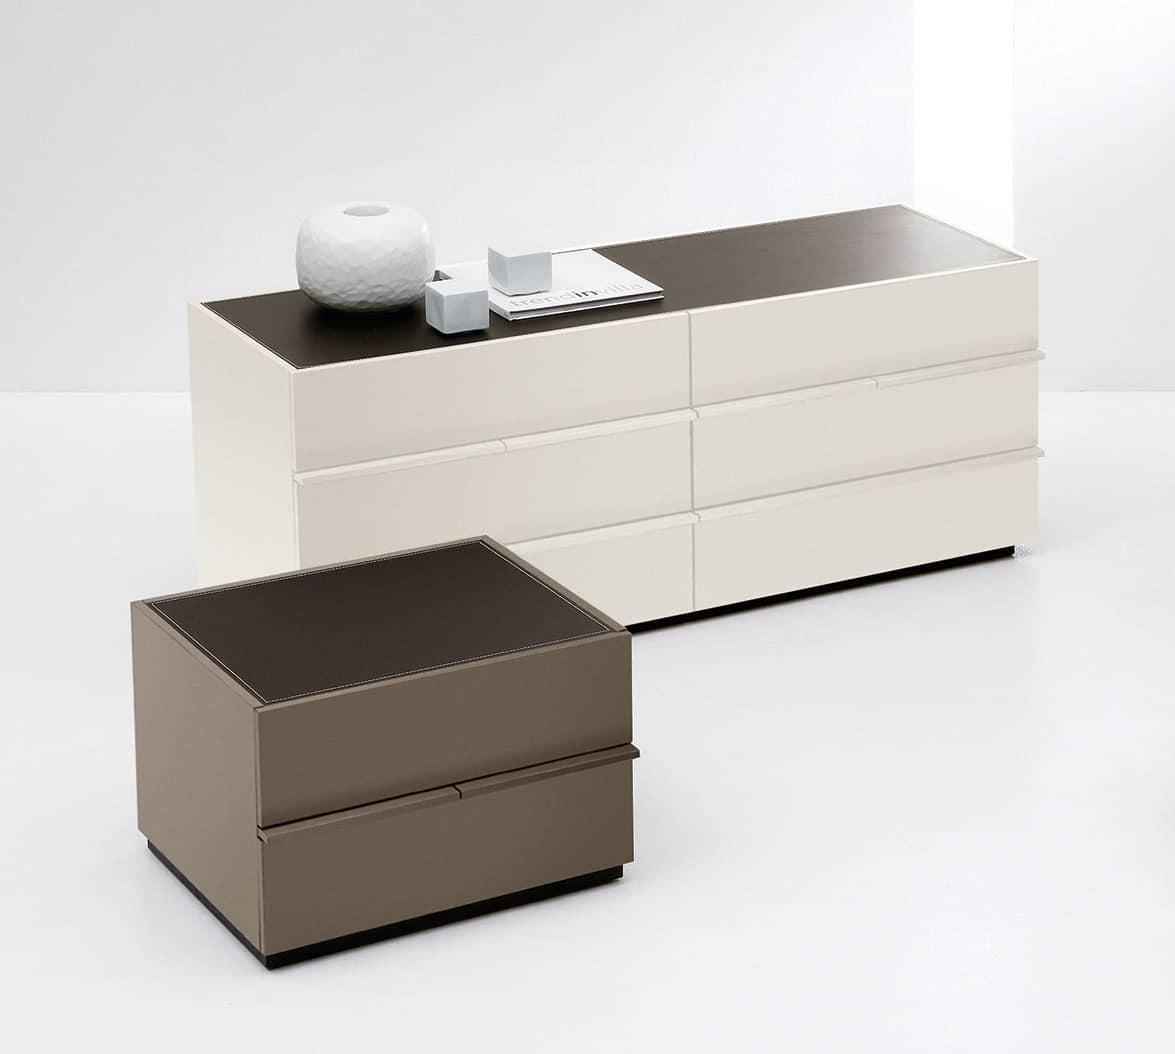 Home Kitchen Design App Modern Dresser In Minimalist Style For Bedroom Idfdesign